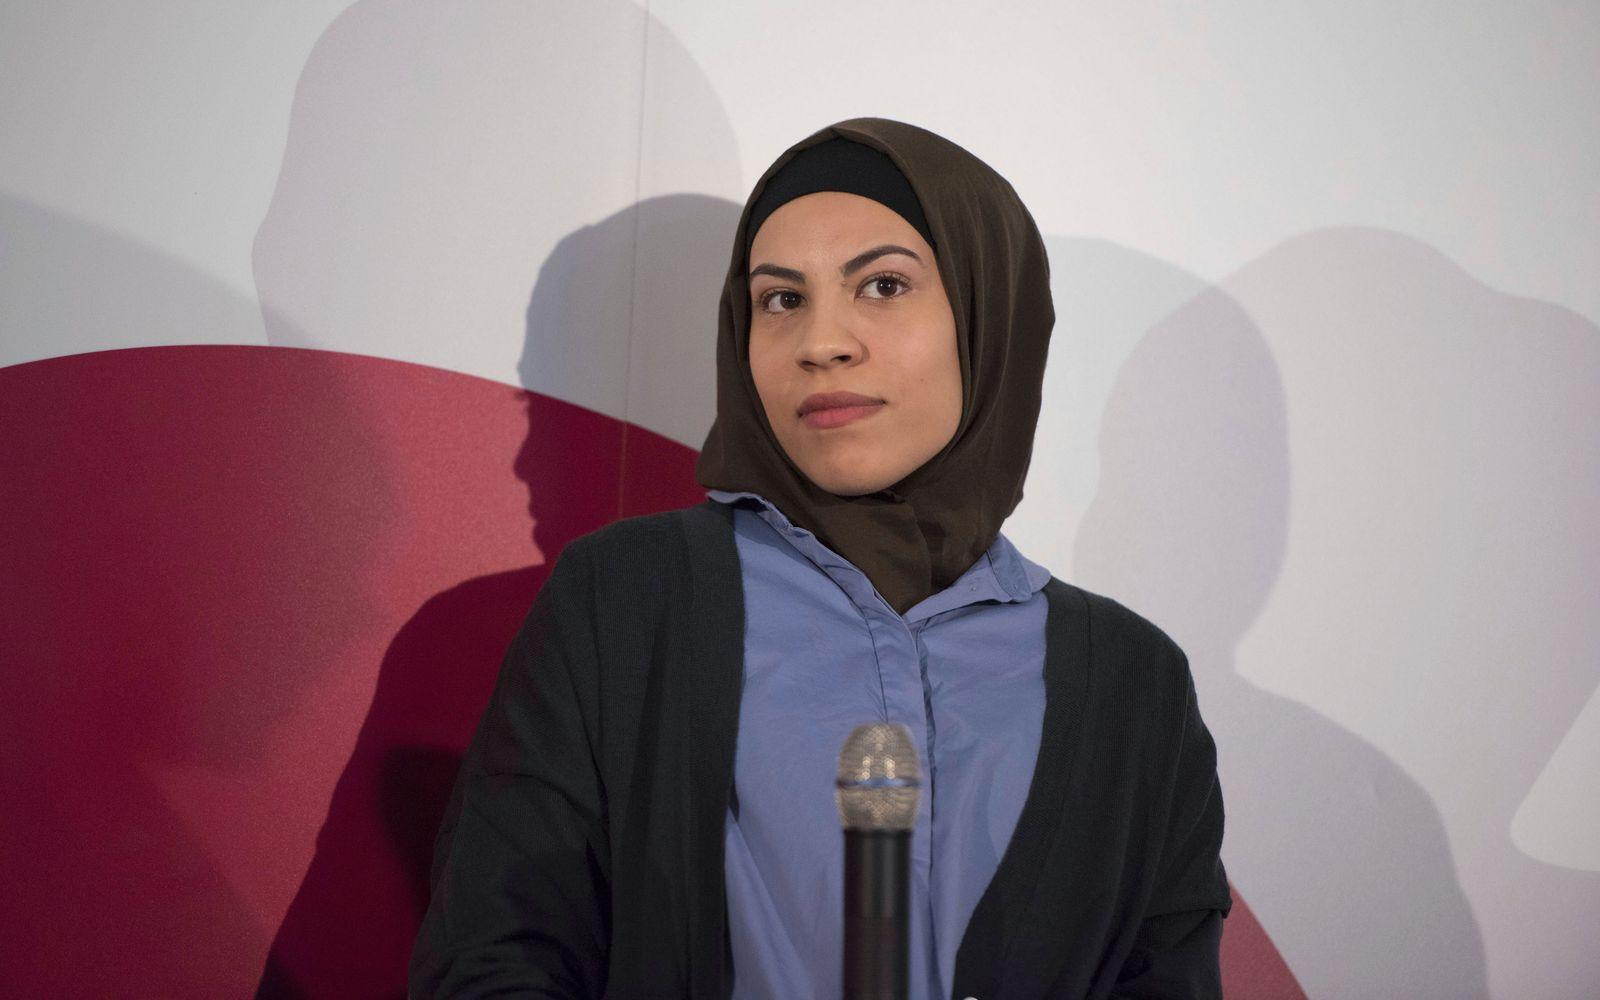 DEU, Deutschland, Germany, Berlin, 03.02.2016: YouTuberIn Nemi El-Hassan (Dattelt?ter) bei einer Pressekonferenz zum Th